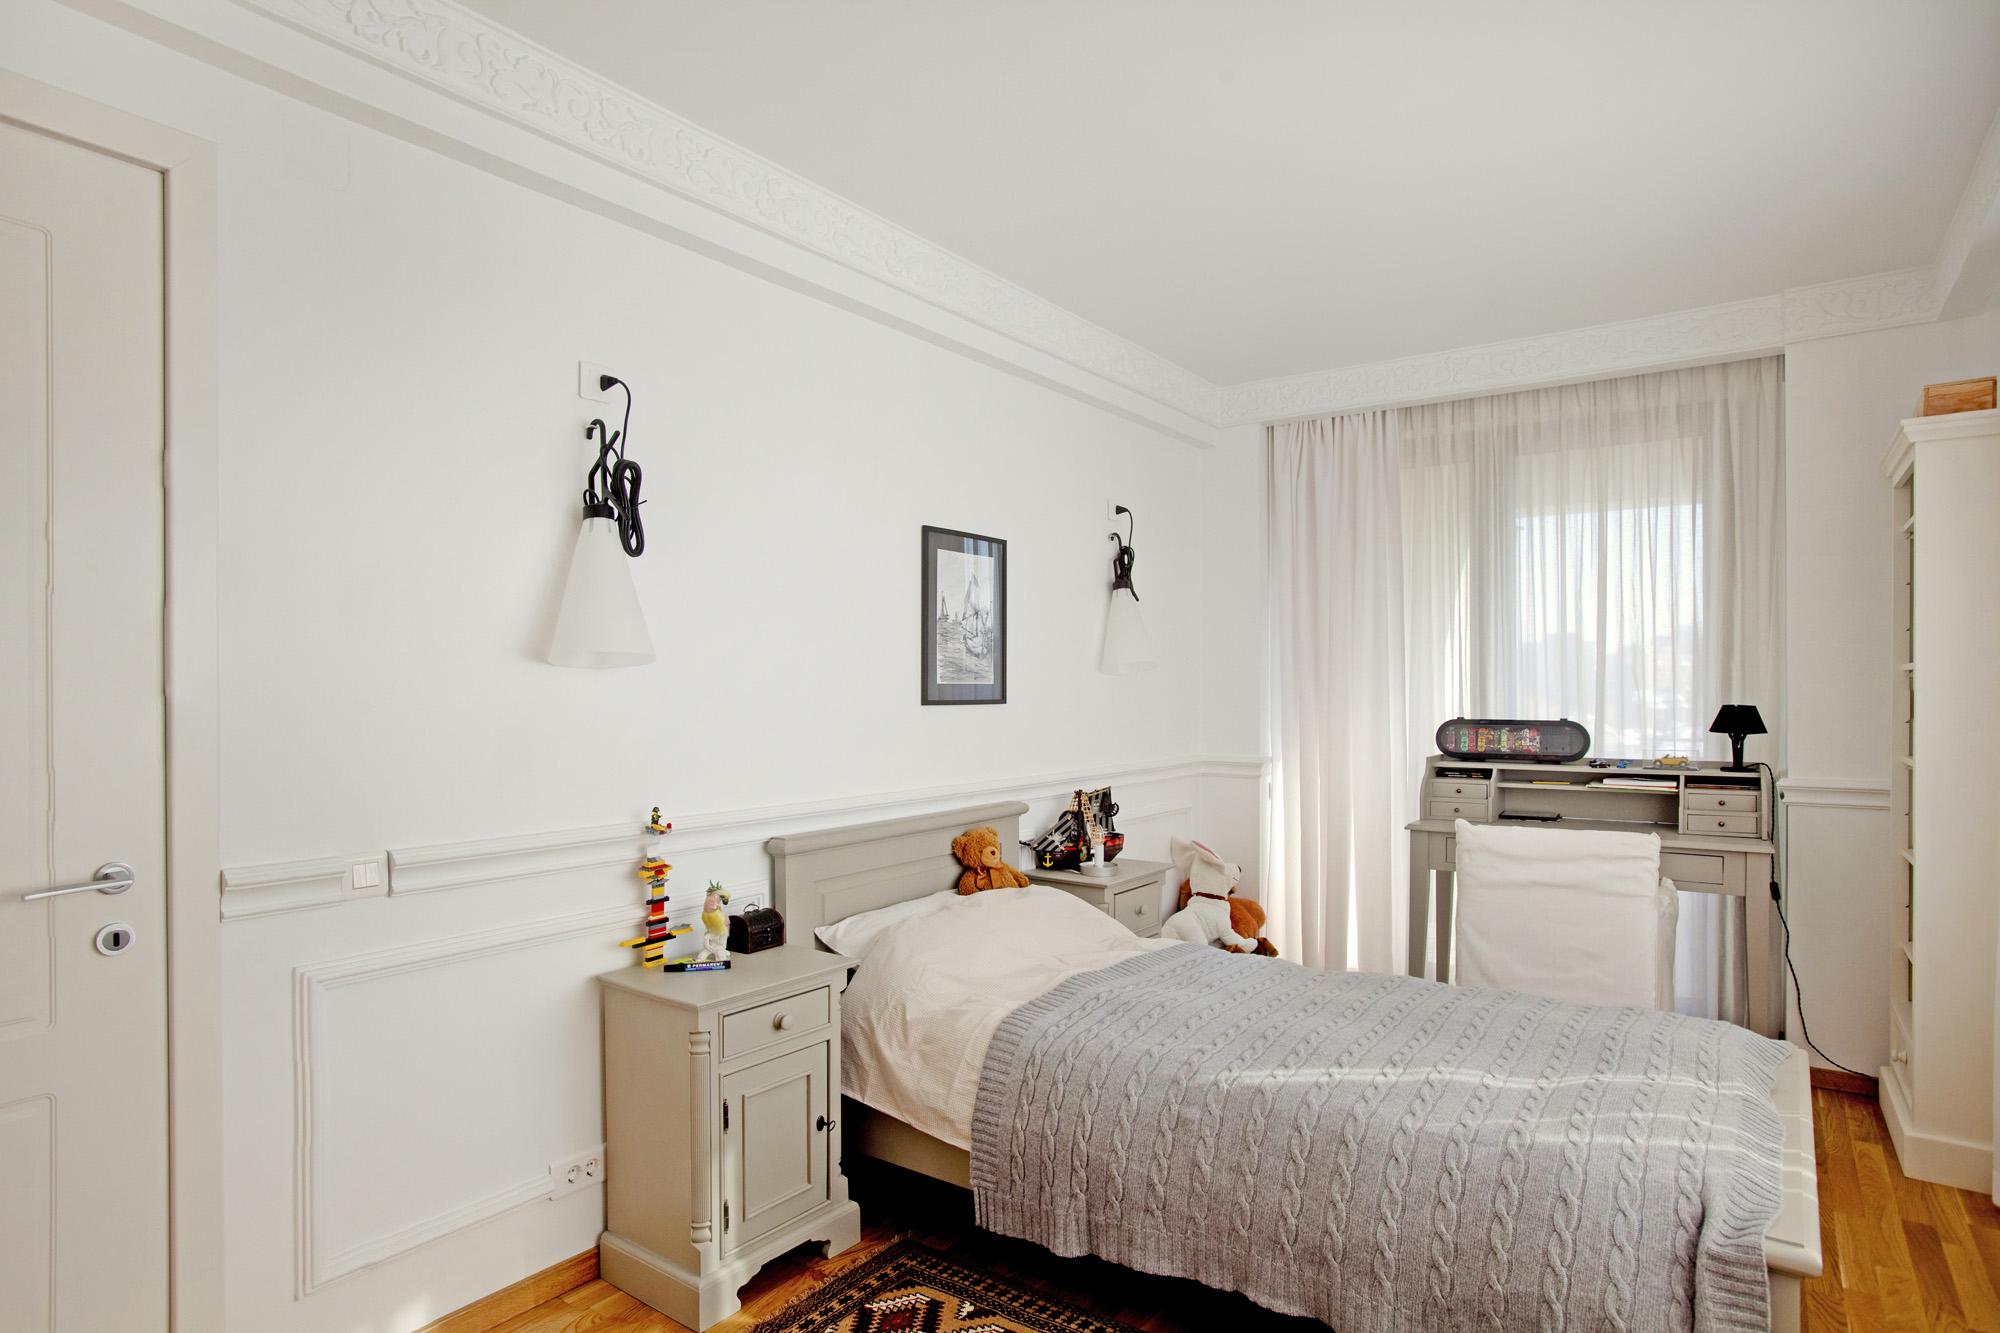 https://ahe-ro.s3.amazonaws.com/12333/apartament-elegant-cu-4-camere-si-terase-generoase-in-centrul-bucurestiului-%284%29.jpg